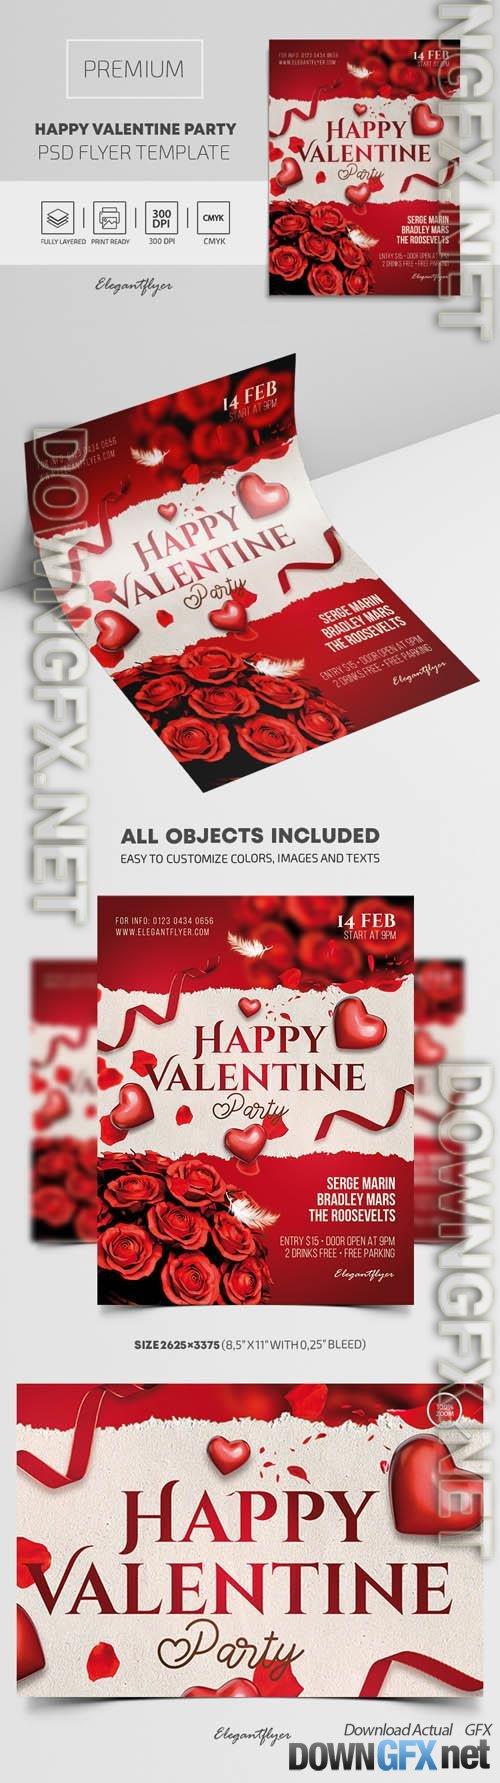 Happy Valentine Party Premium PSD Flyer Template